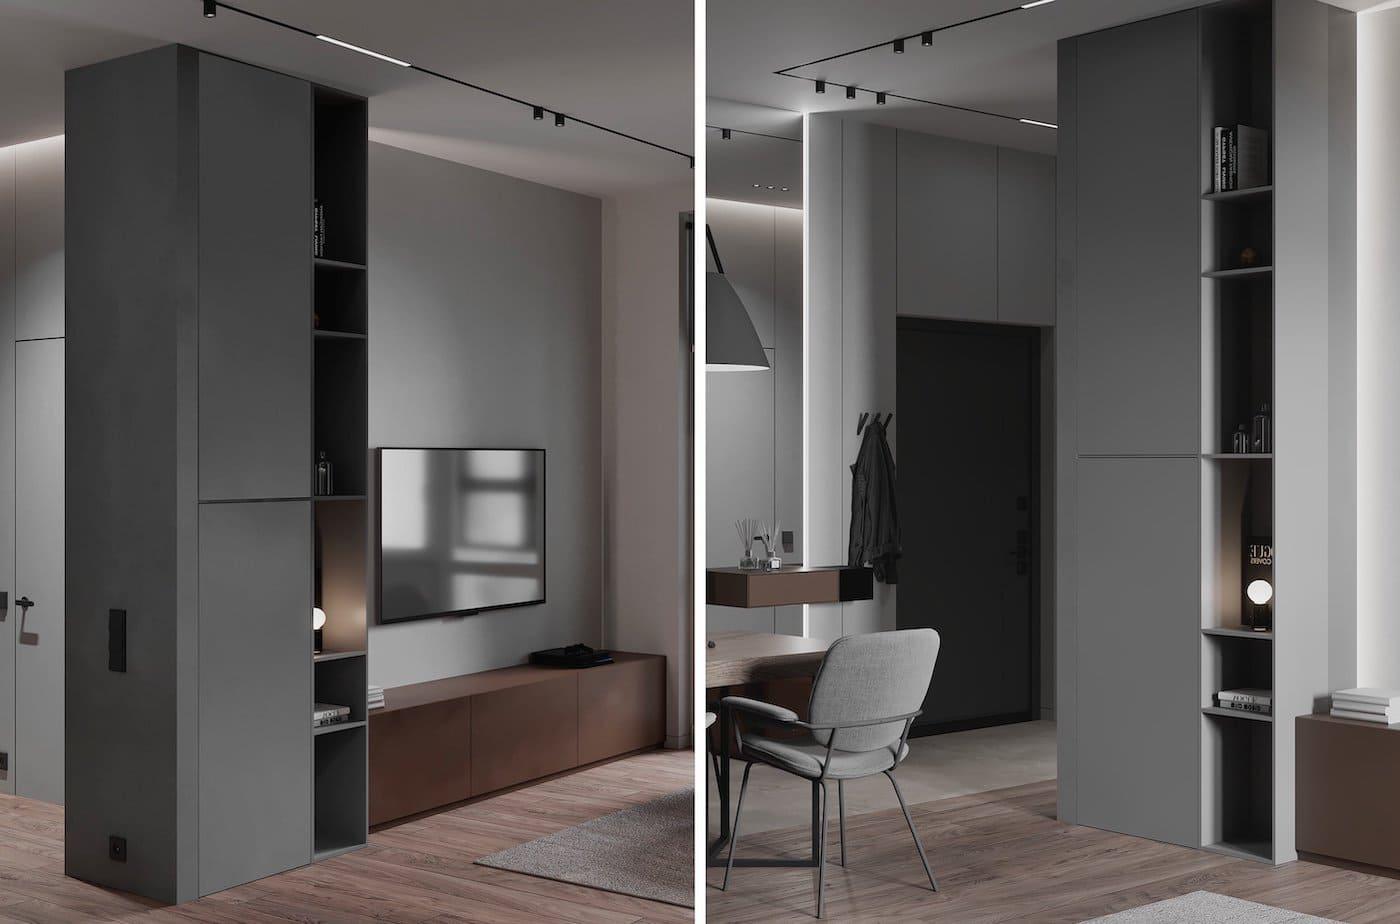 модный дизайн интерьера квартиры фото 4